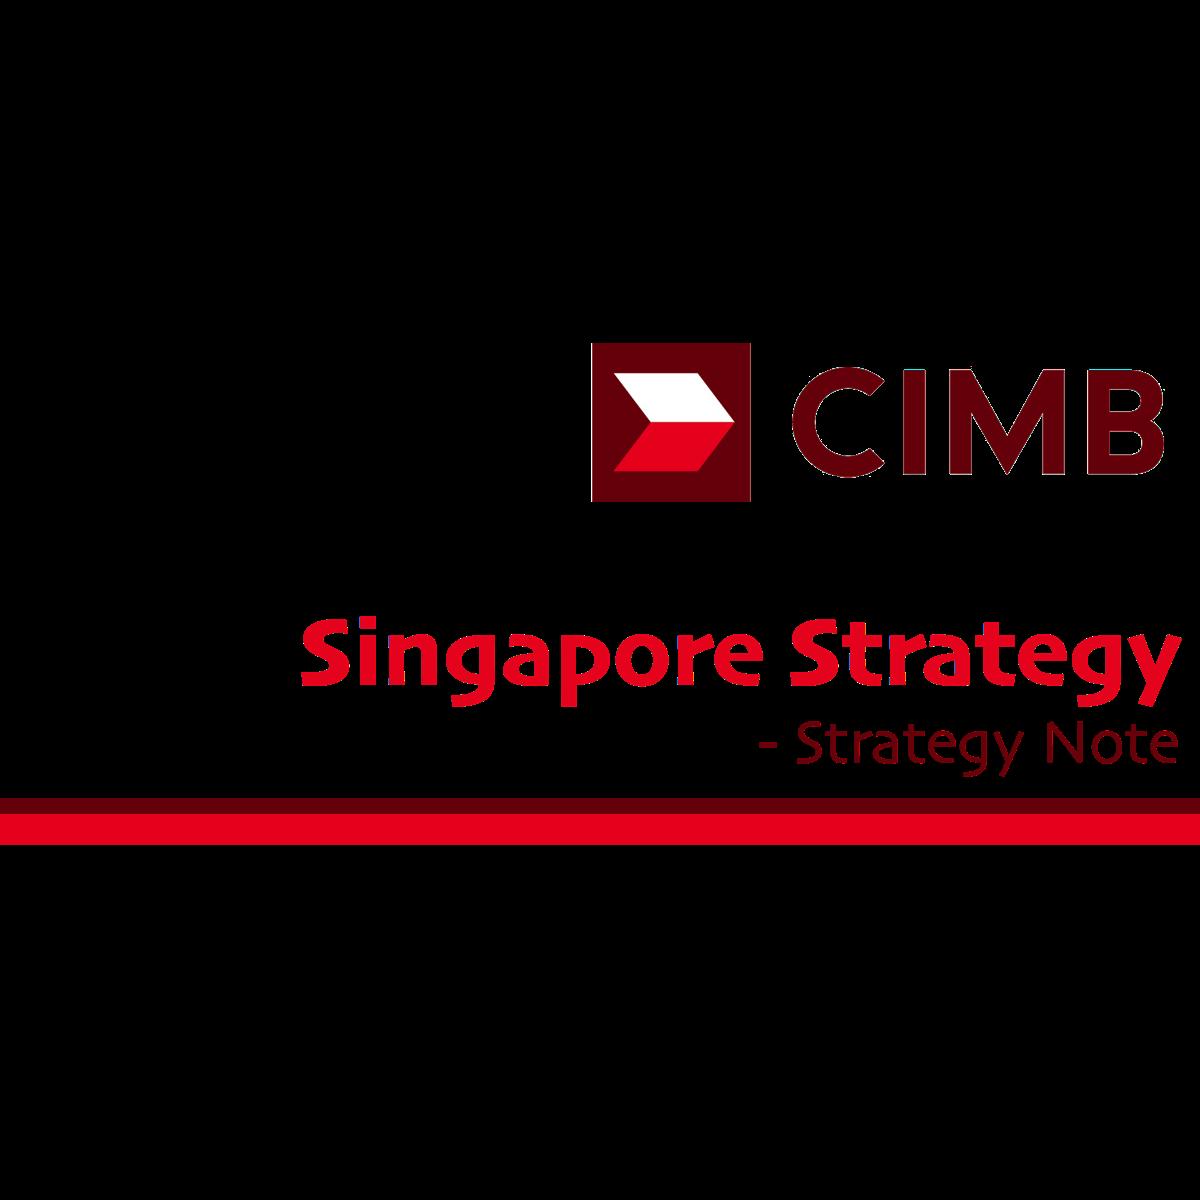 cimb organization chart 2018